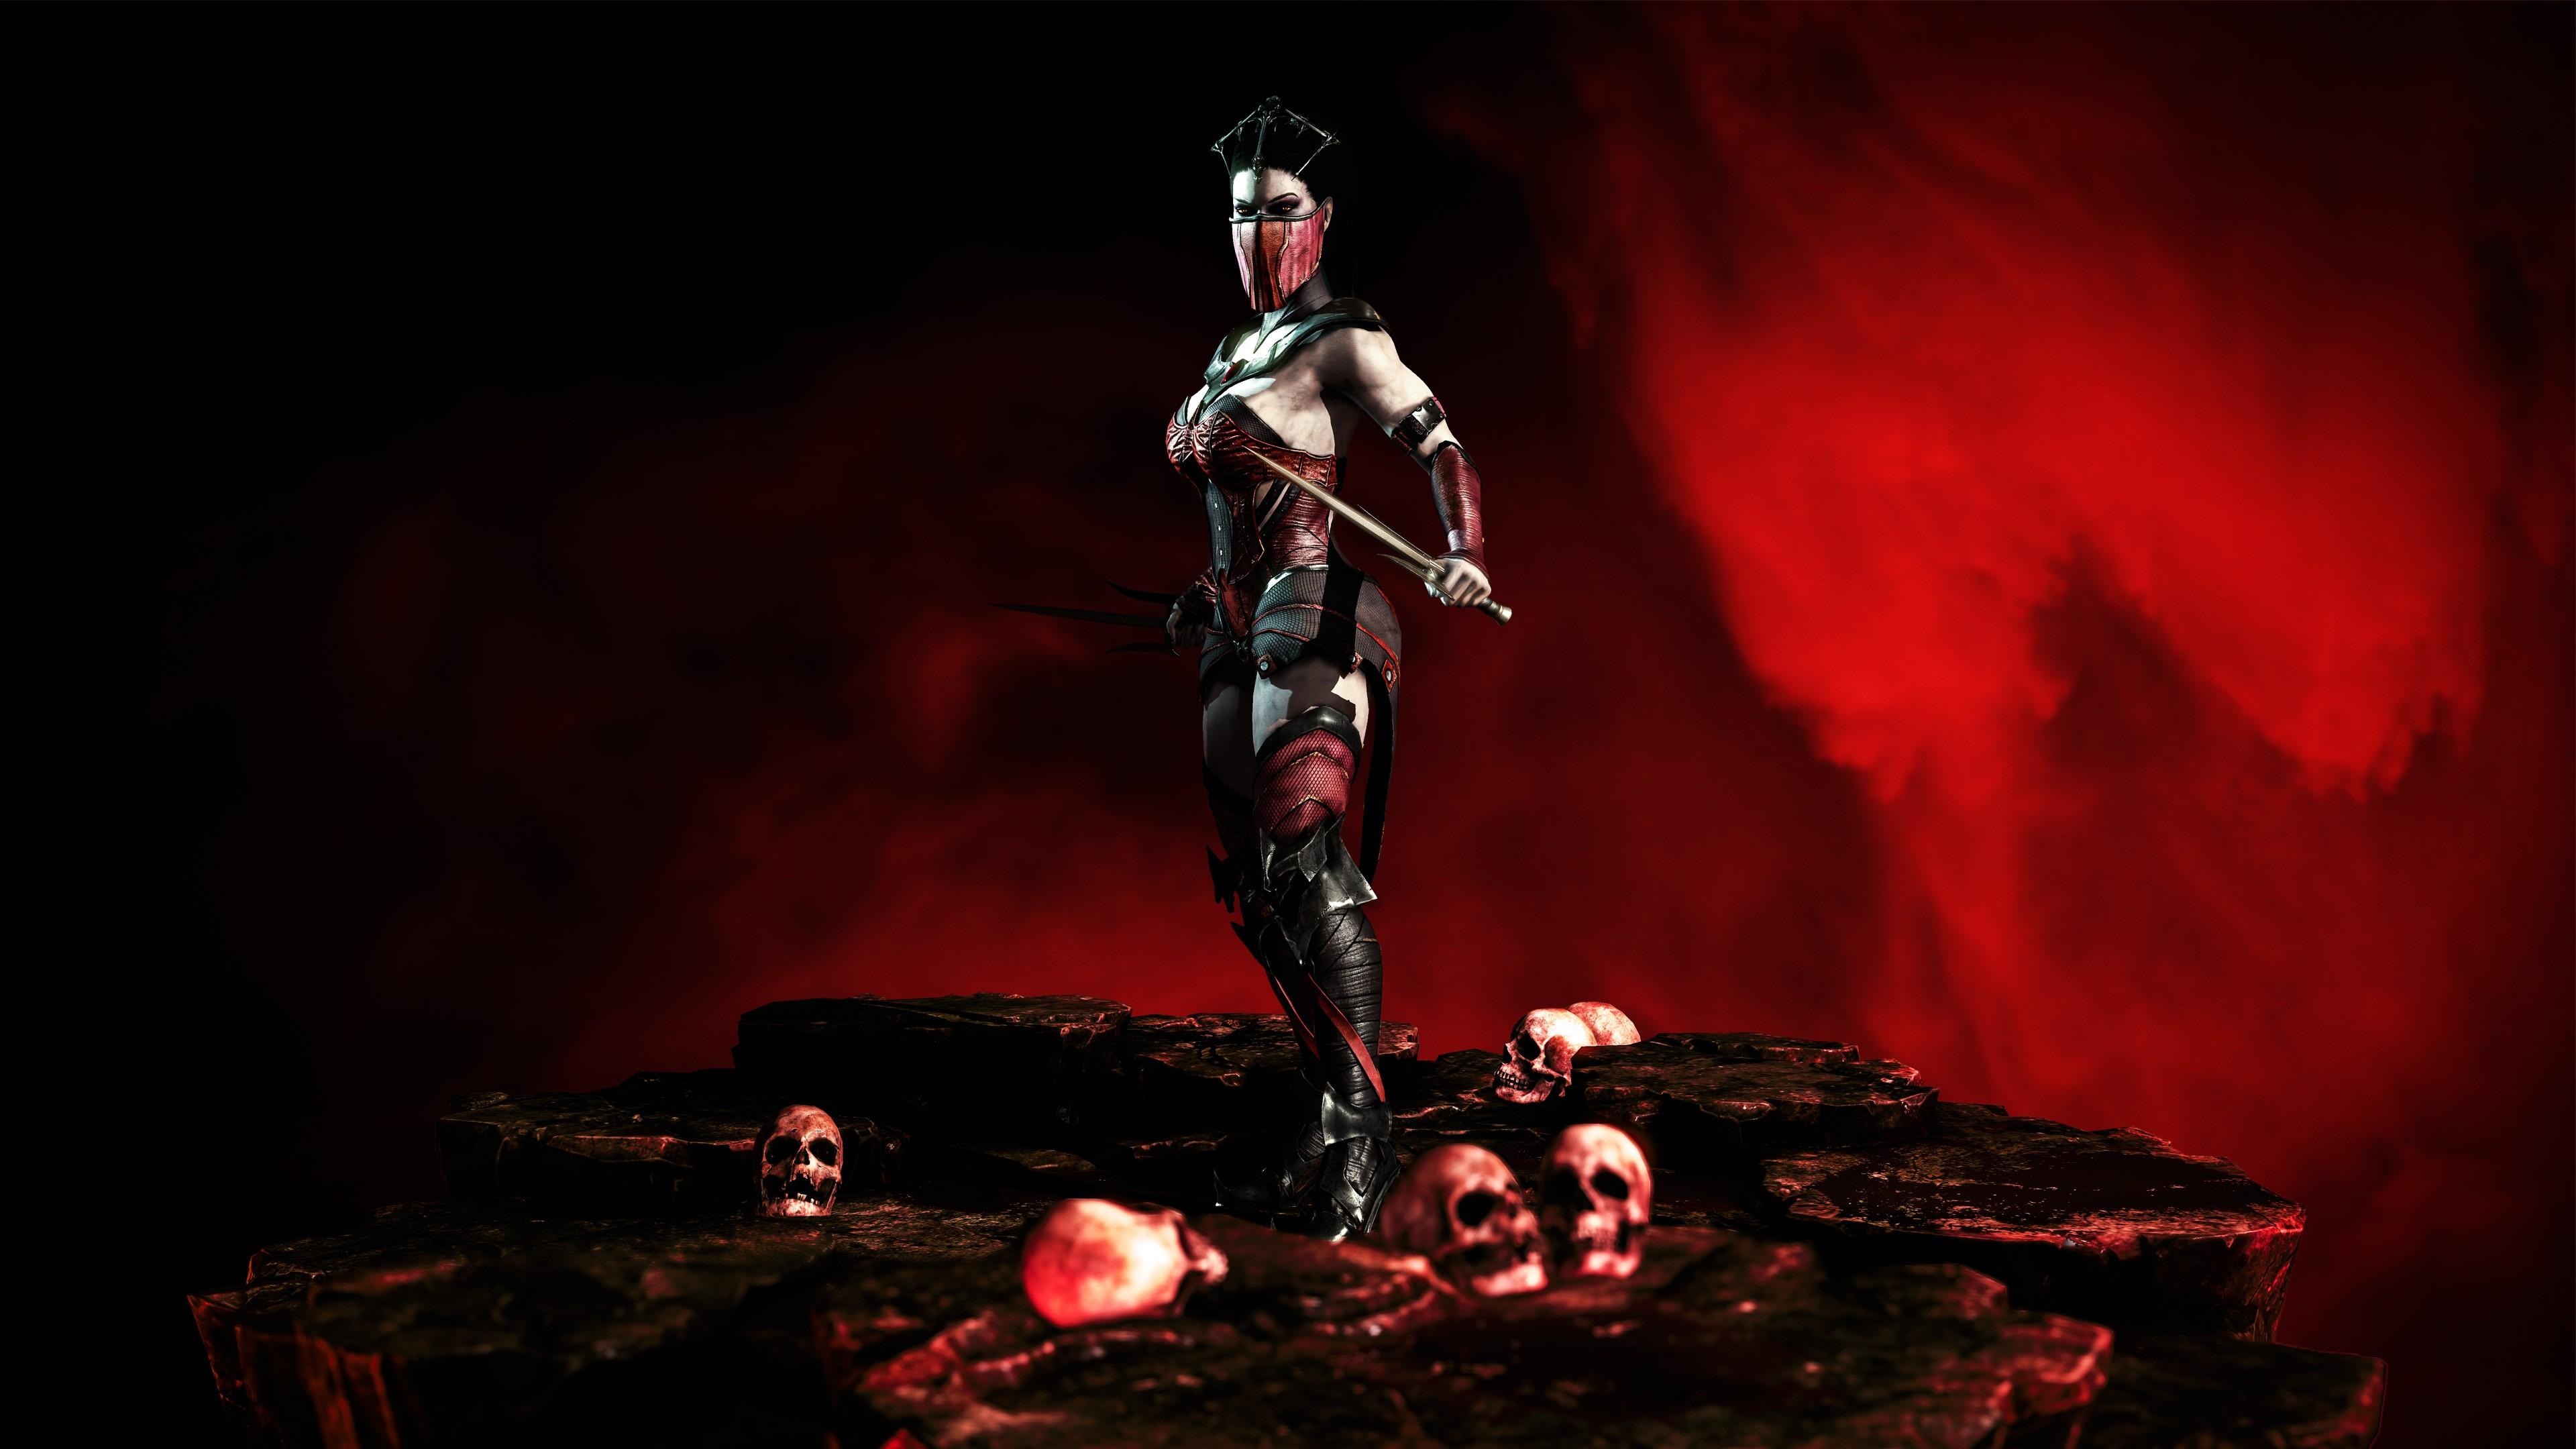 Mortal Kombat X Mileena Ps4wallpapers Com